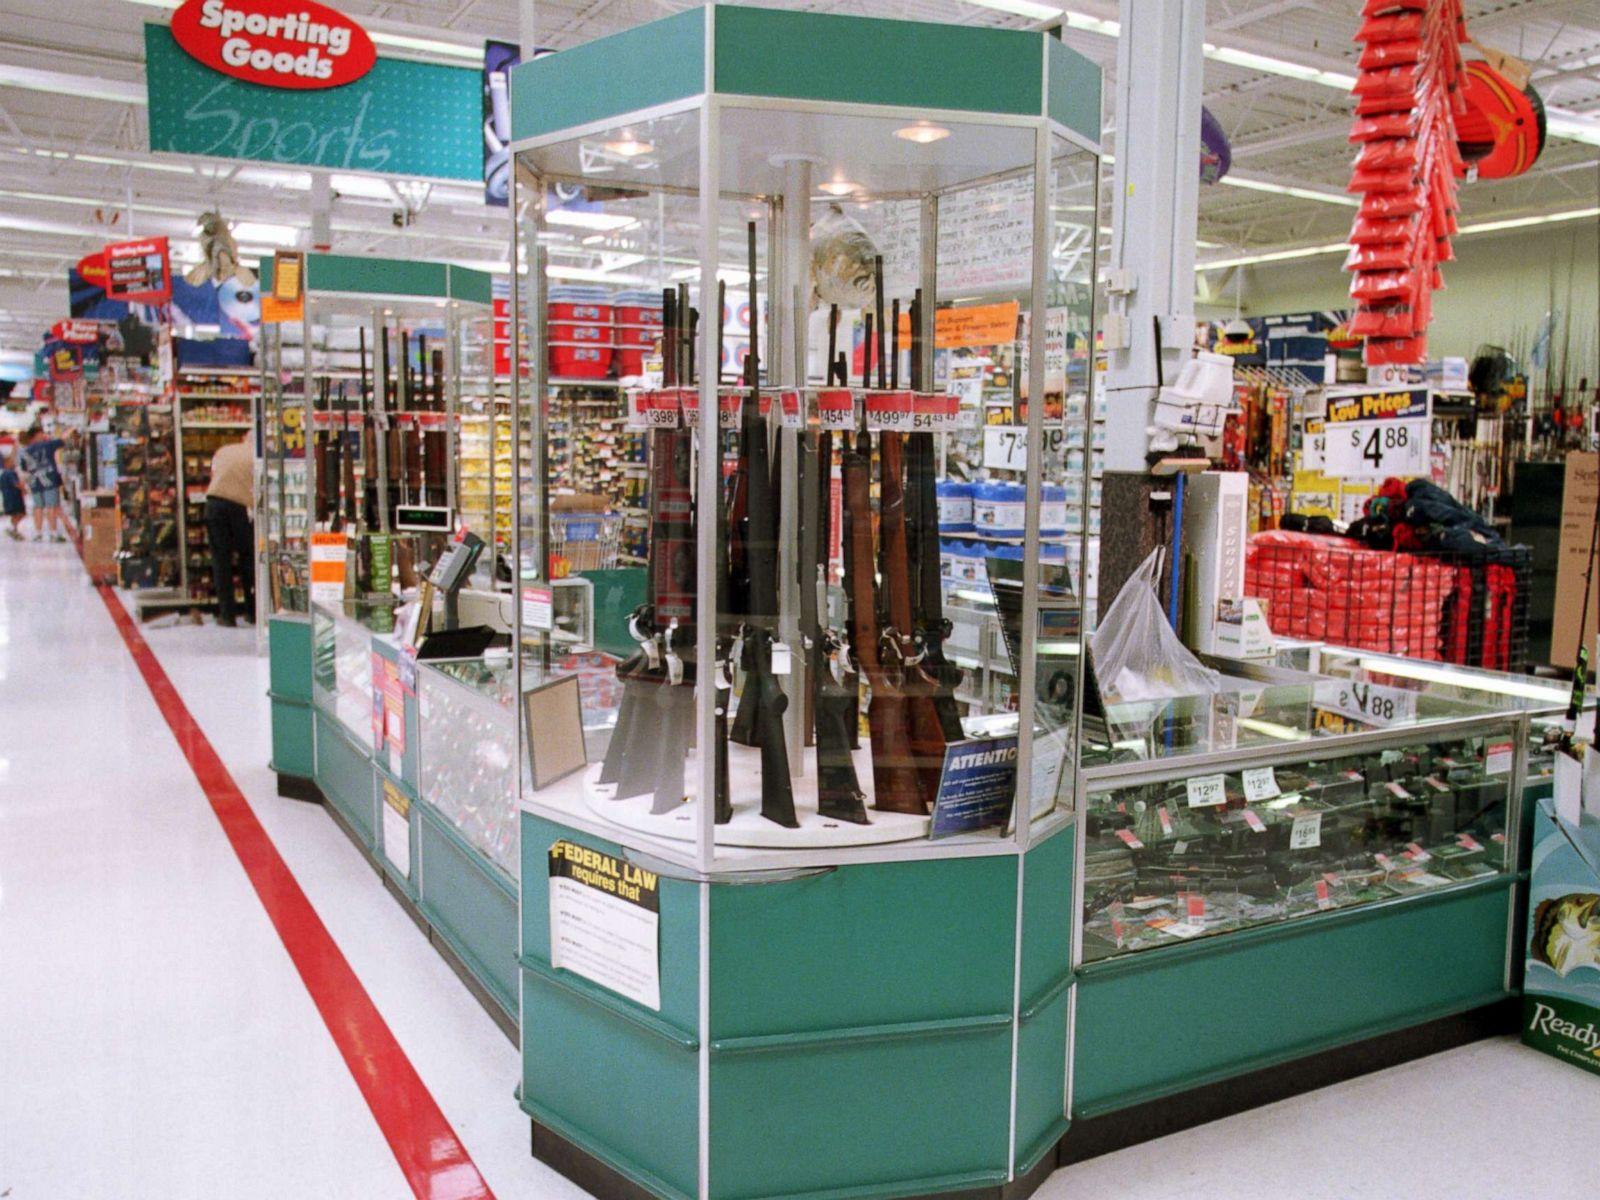 Walmart to limit sales of guns, ammunition in wake of